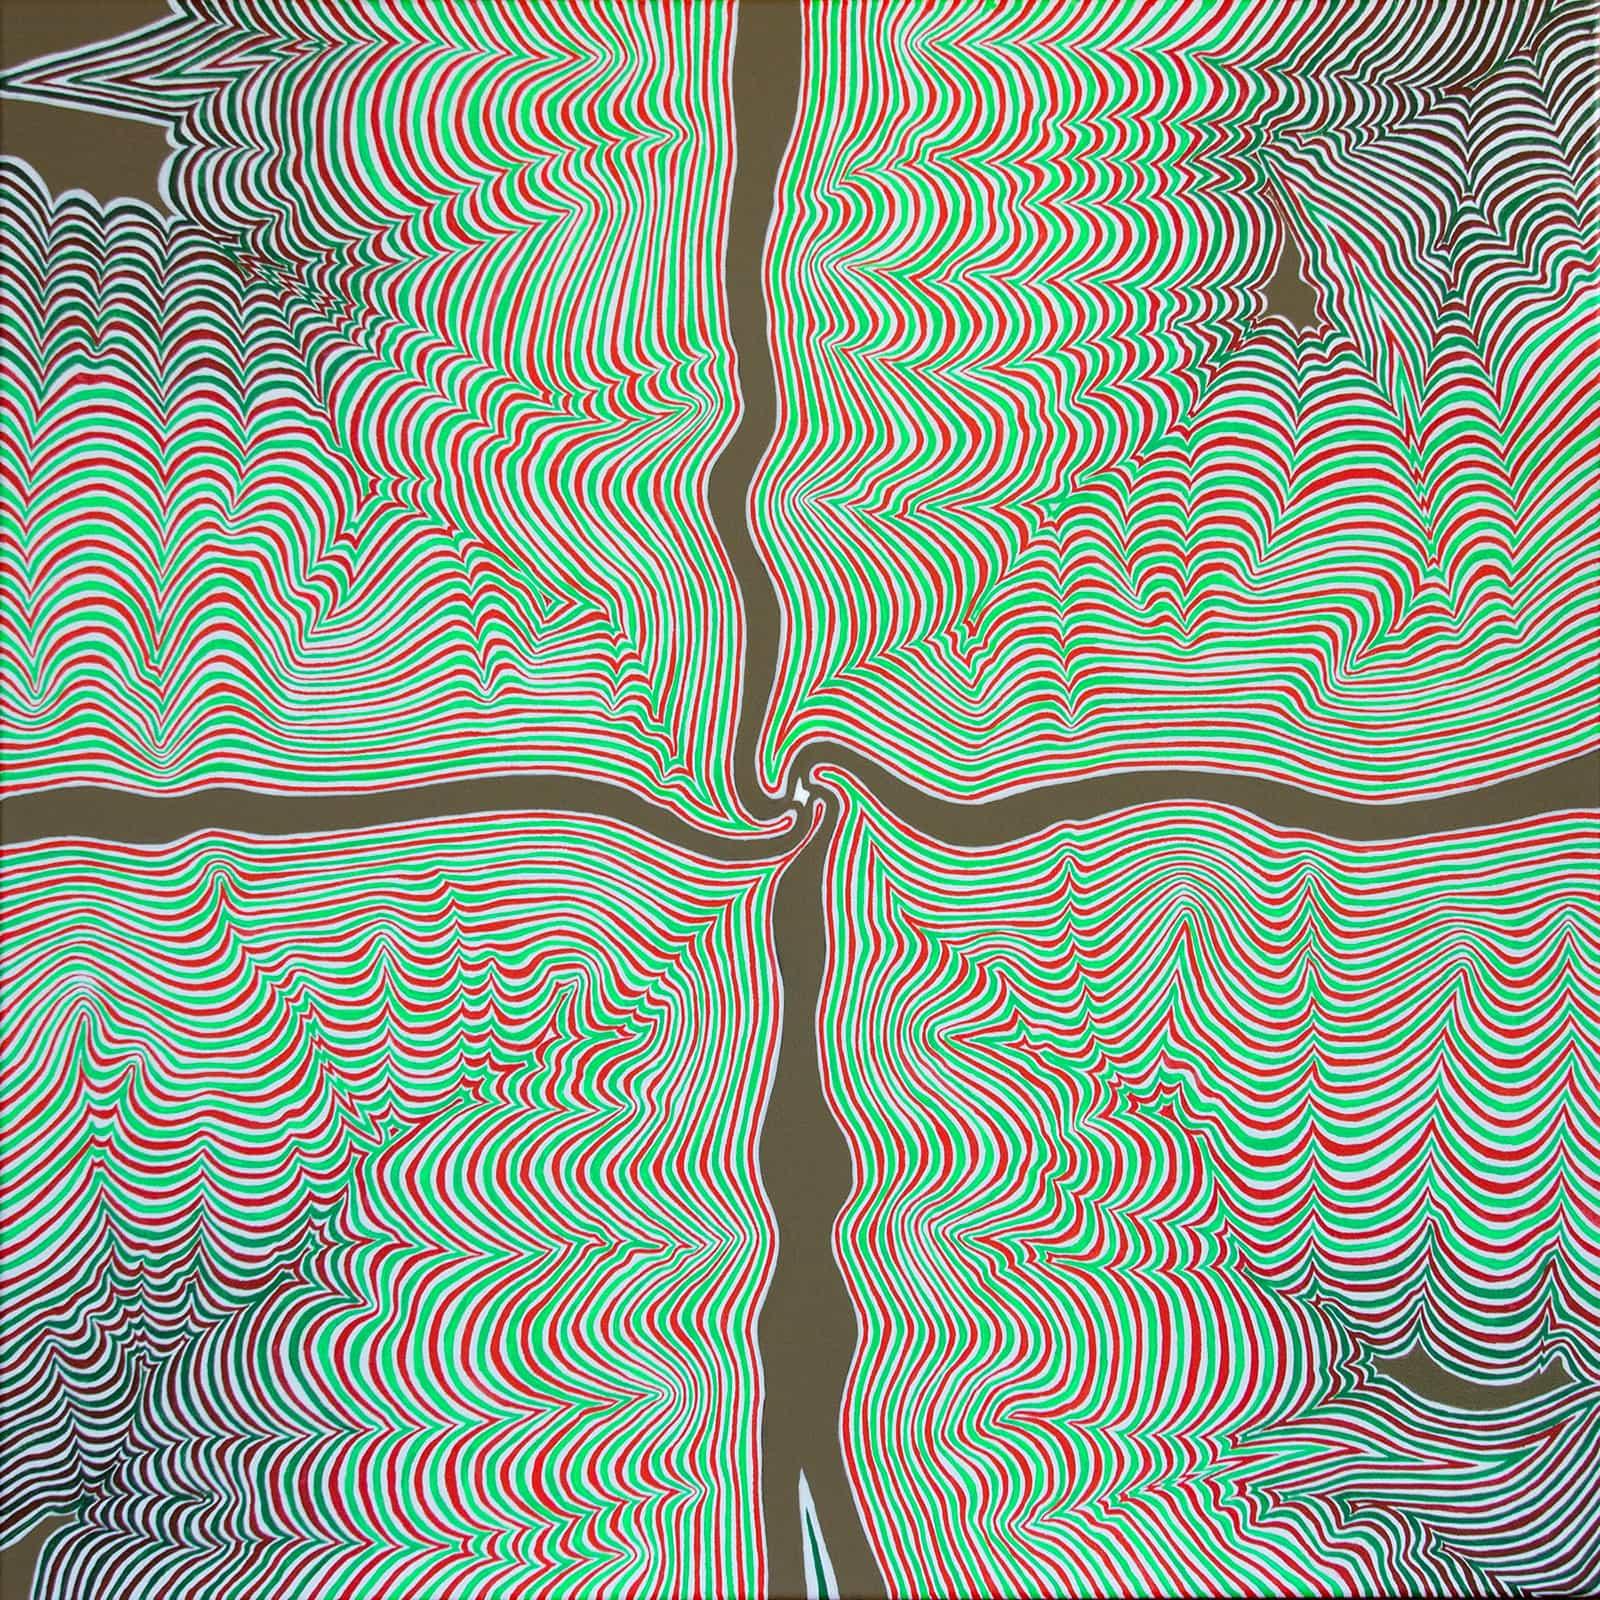 Felix Thyes, Paradies, September 2017, 80 x 80 cm, Acryl auf Leinwand